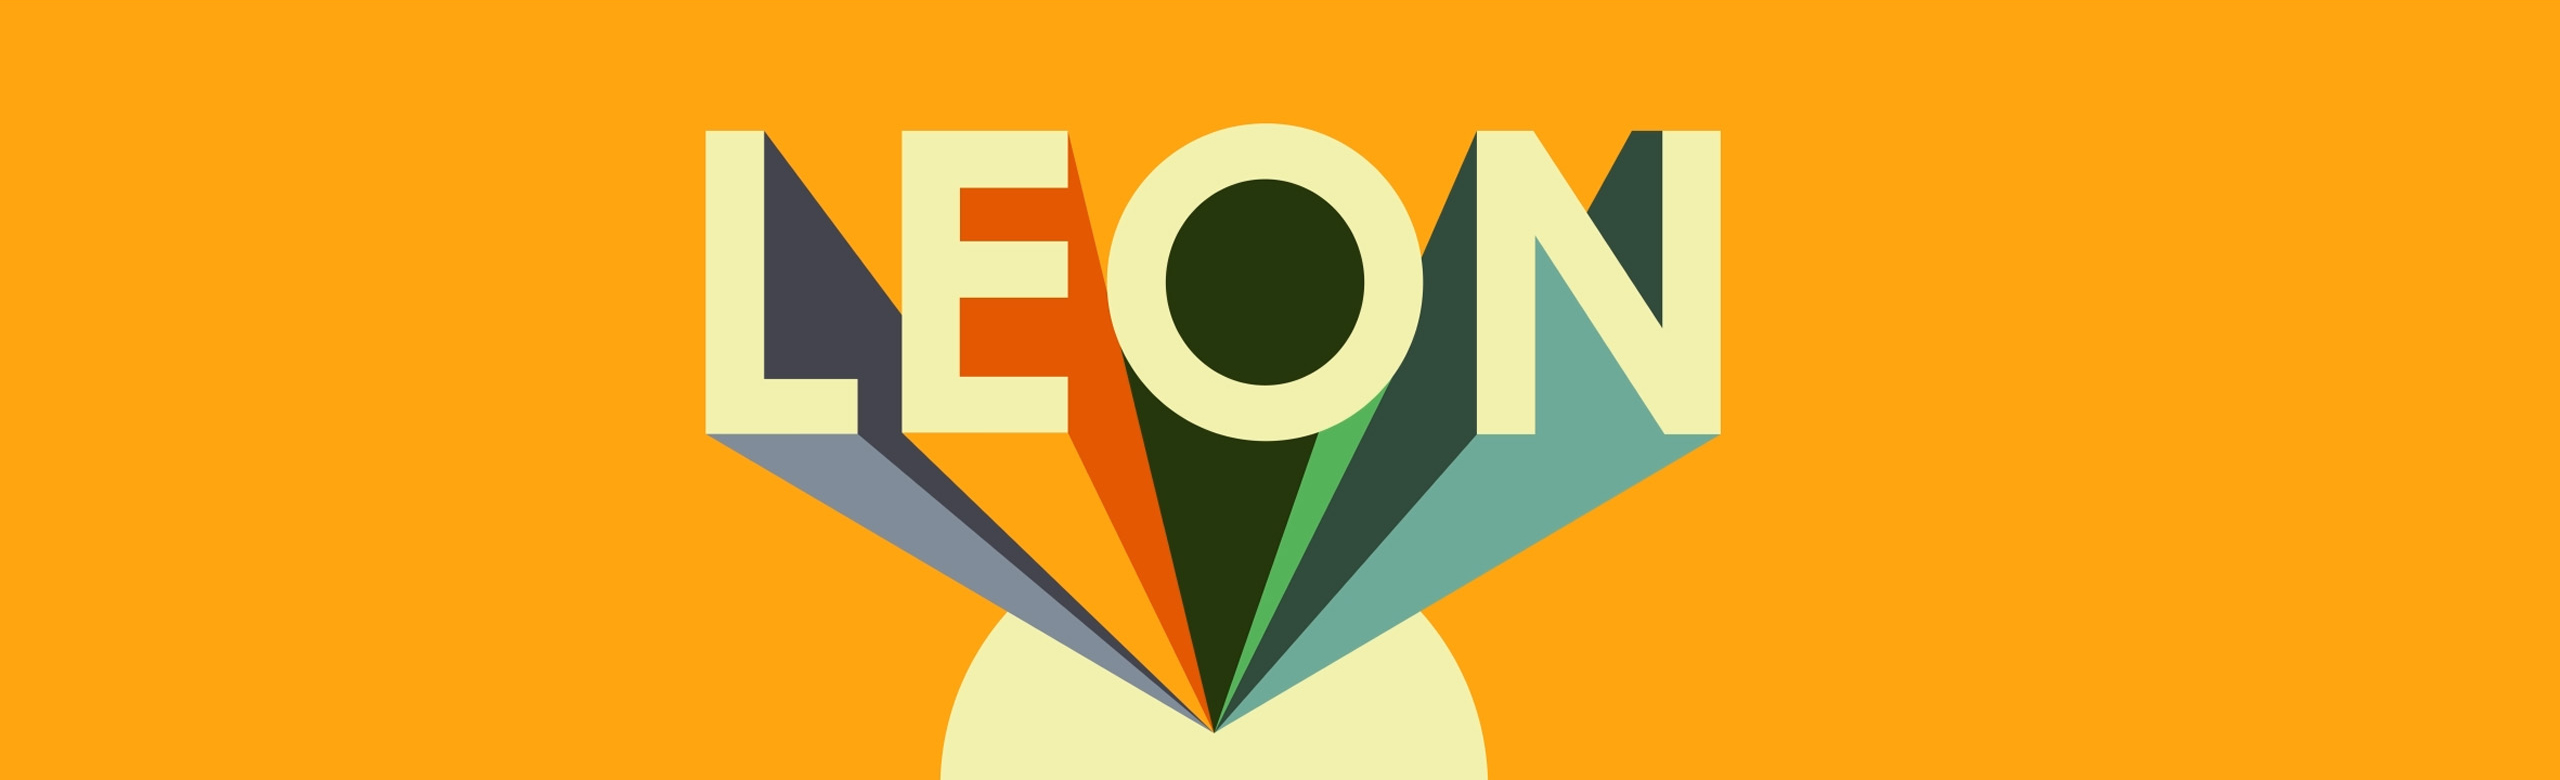 Leon logo and assorted menu items